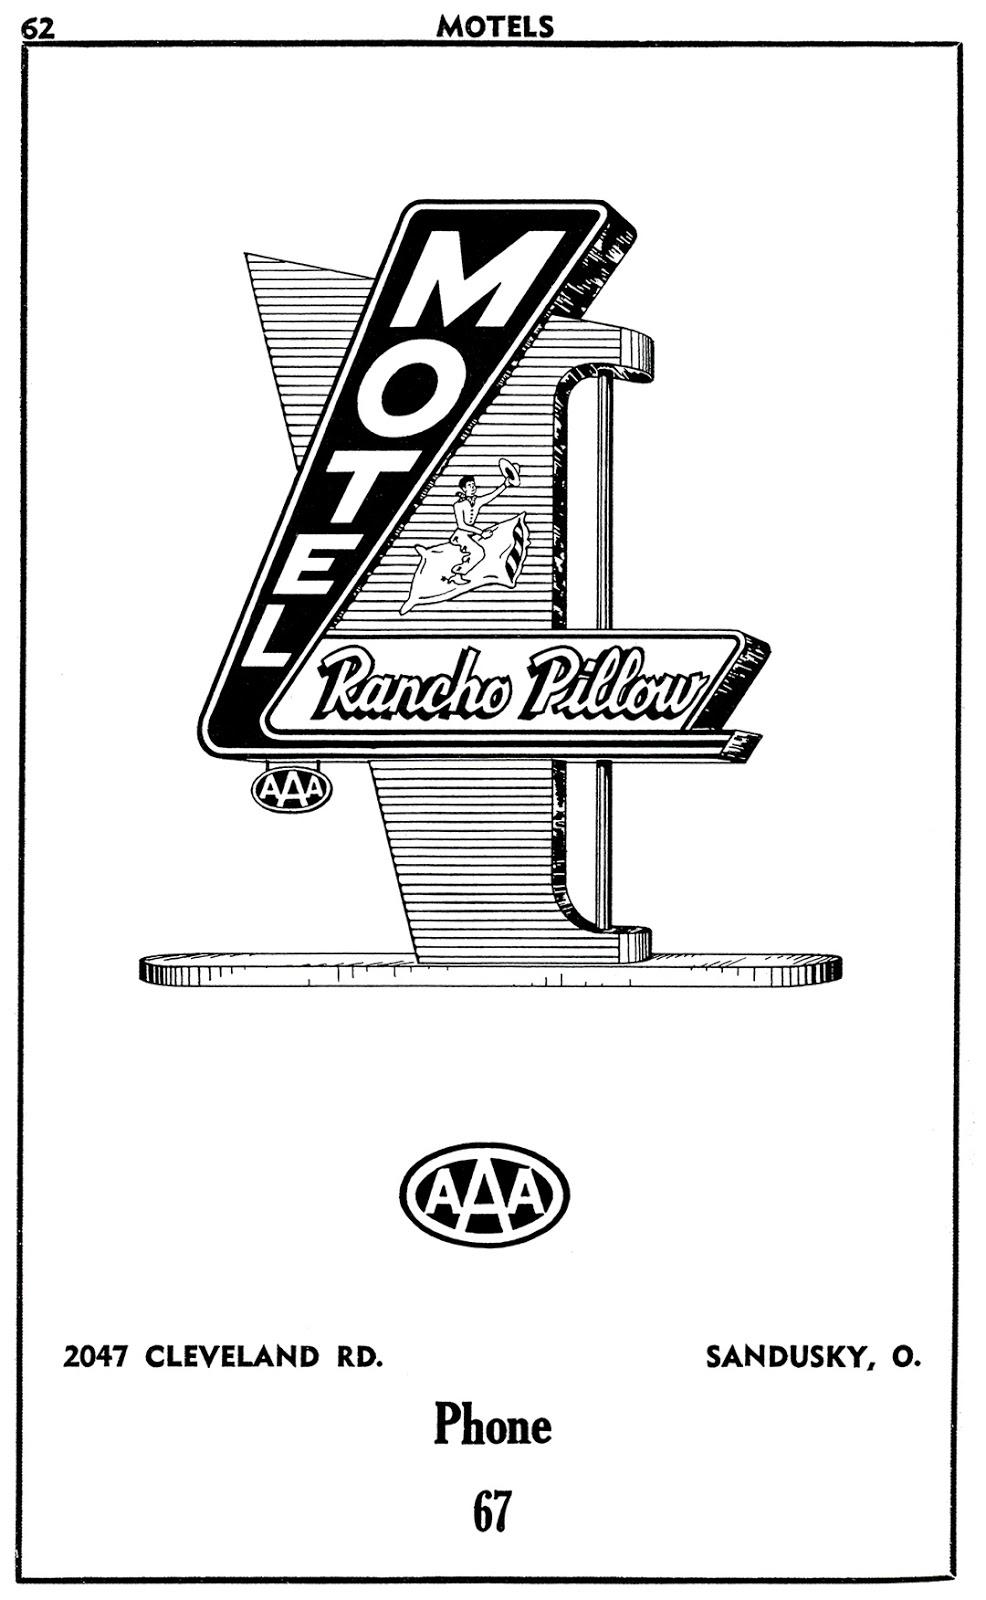 Rancho Pillow Motel - 2047 Cleveland Road, Sandusky, Ohio U.S.A. - 1955